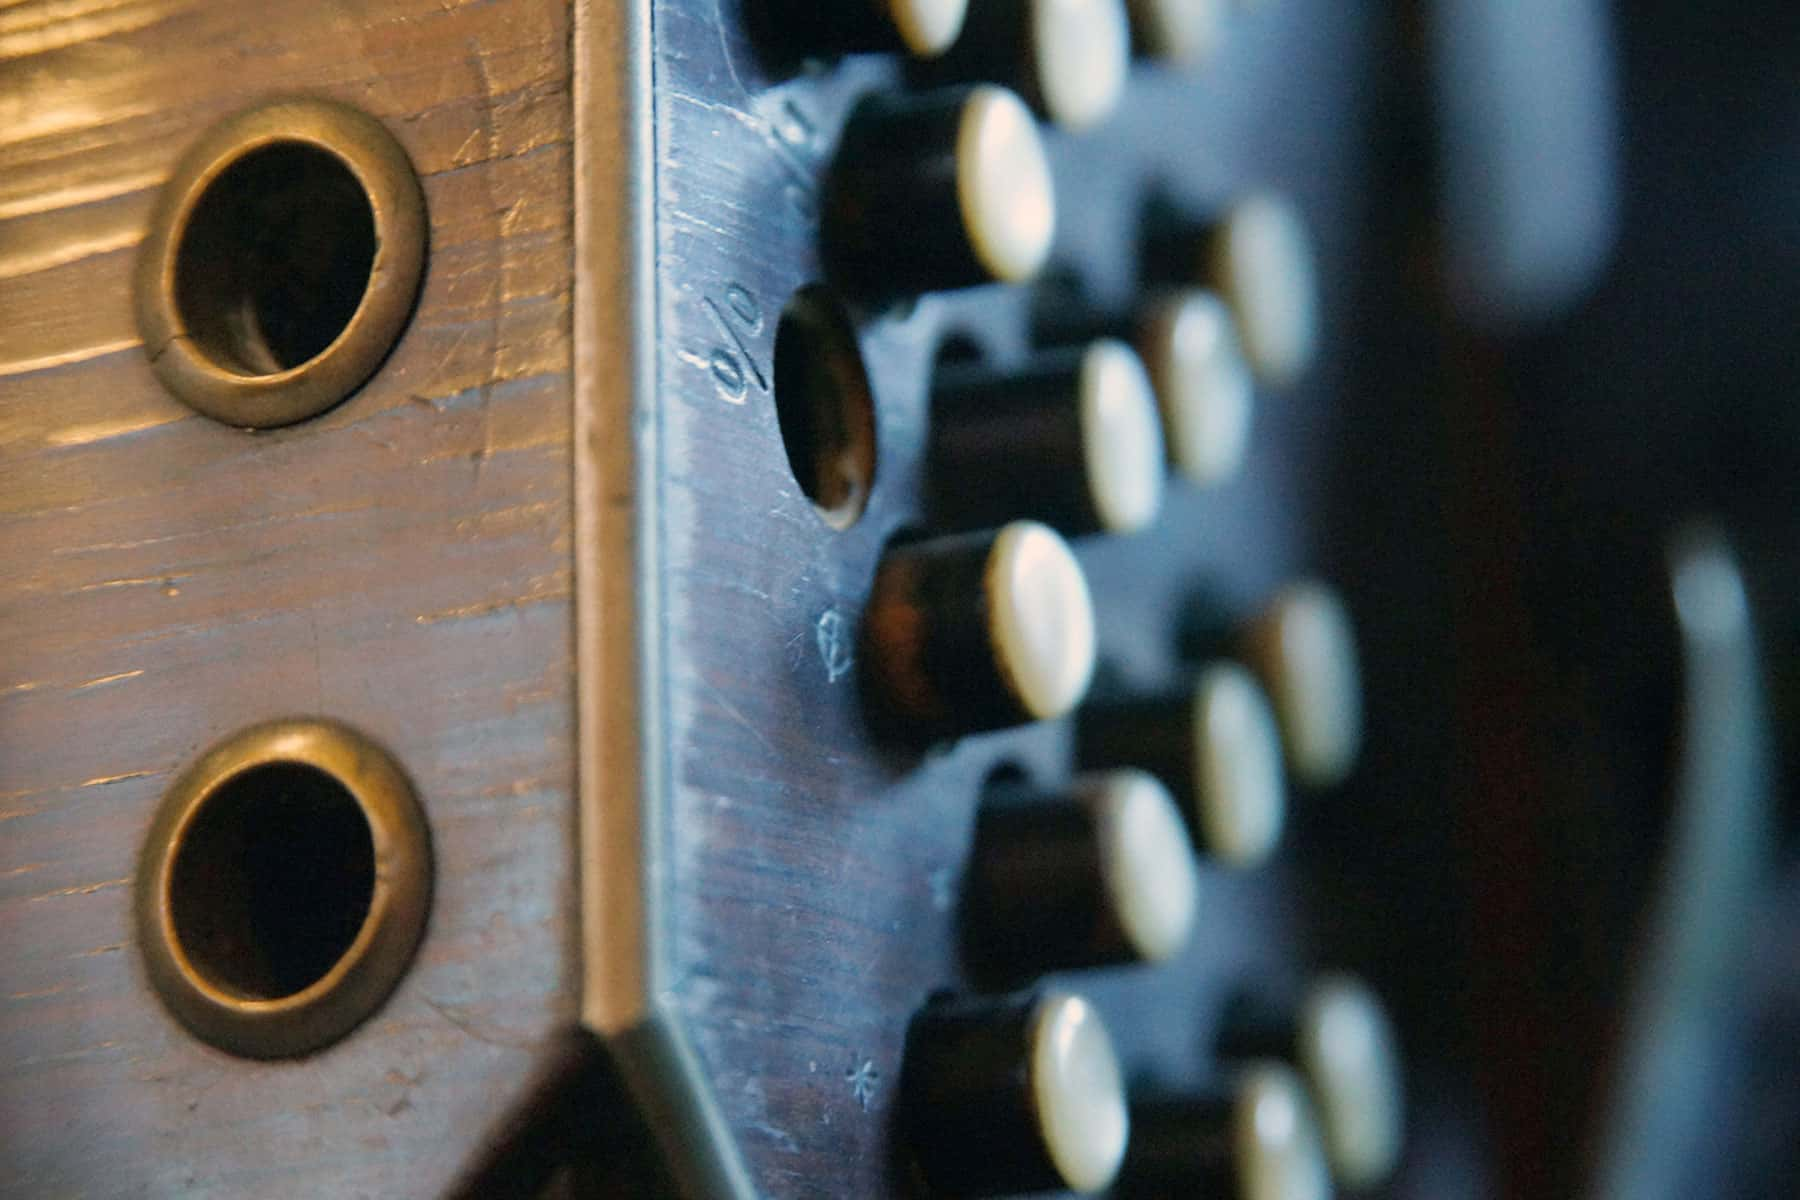 010616_musicexhibitmchs_079